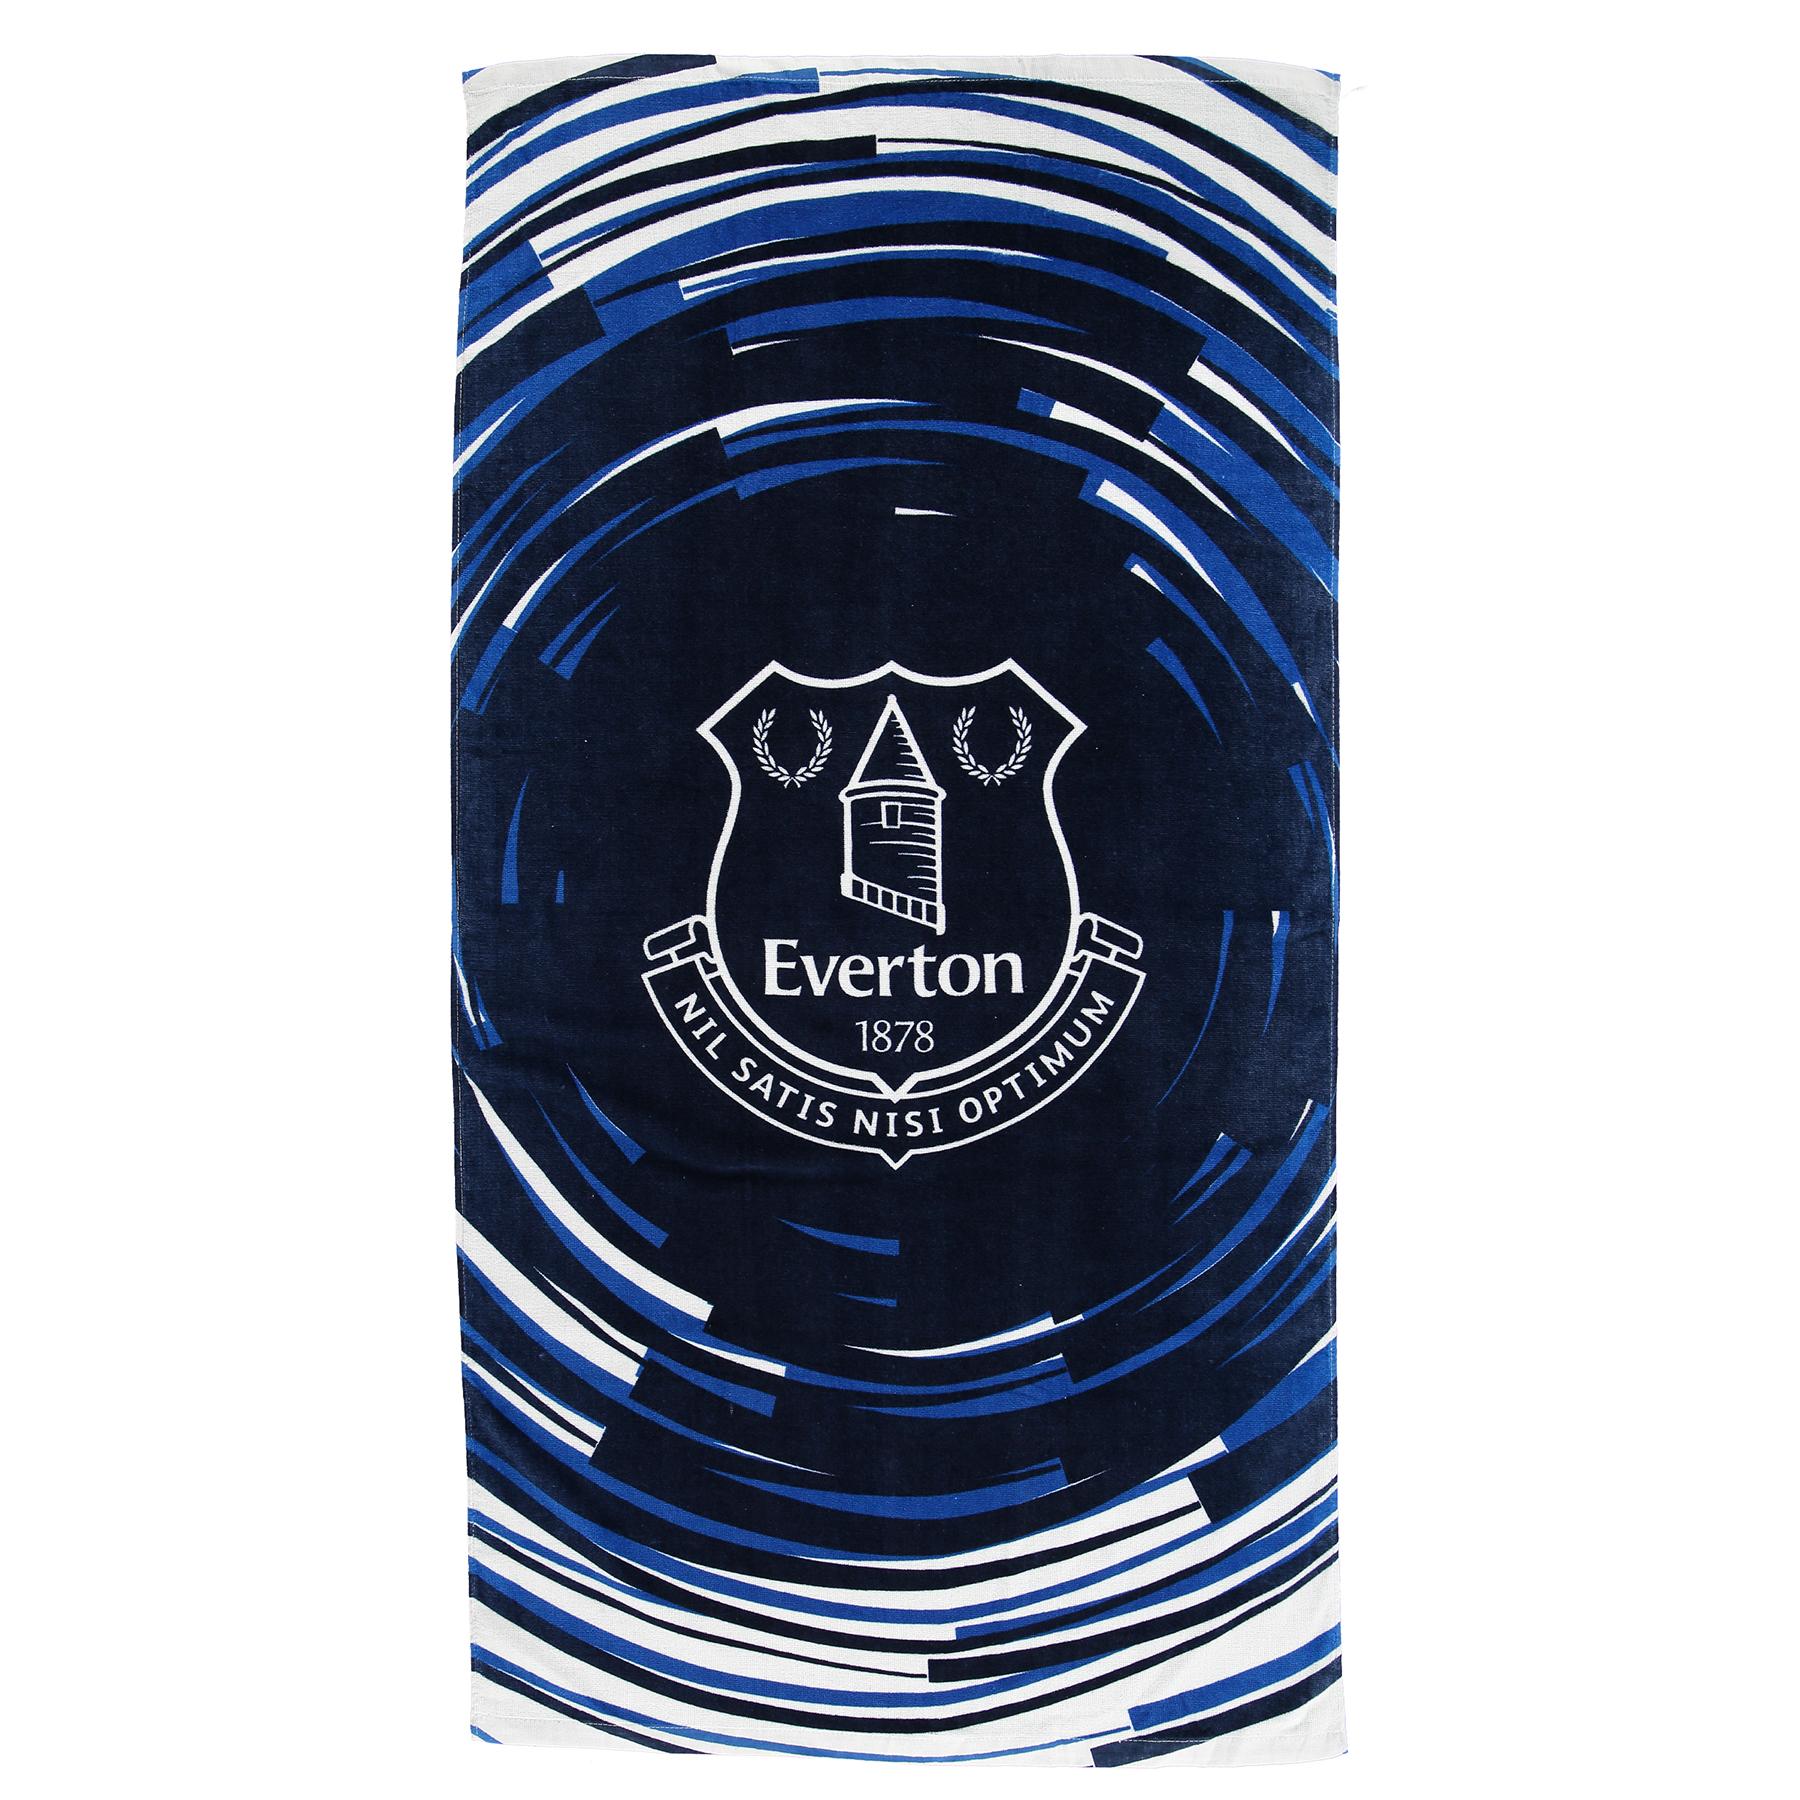 Everton Towel - 140 x 70 cm